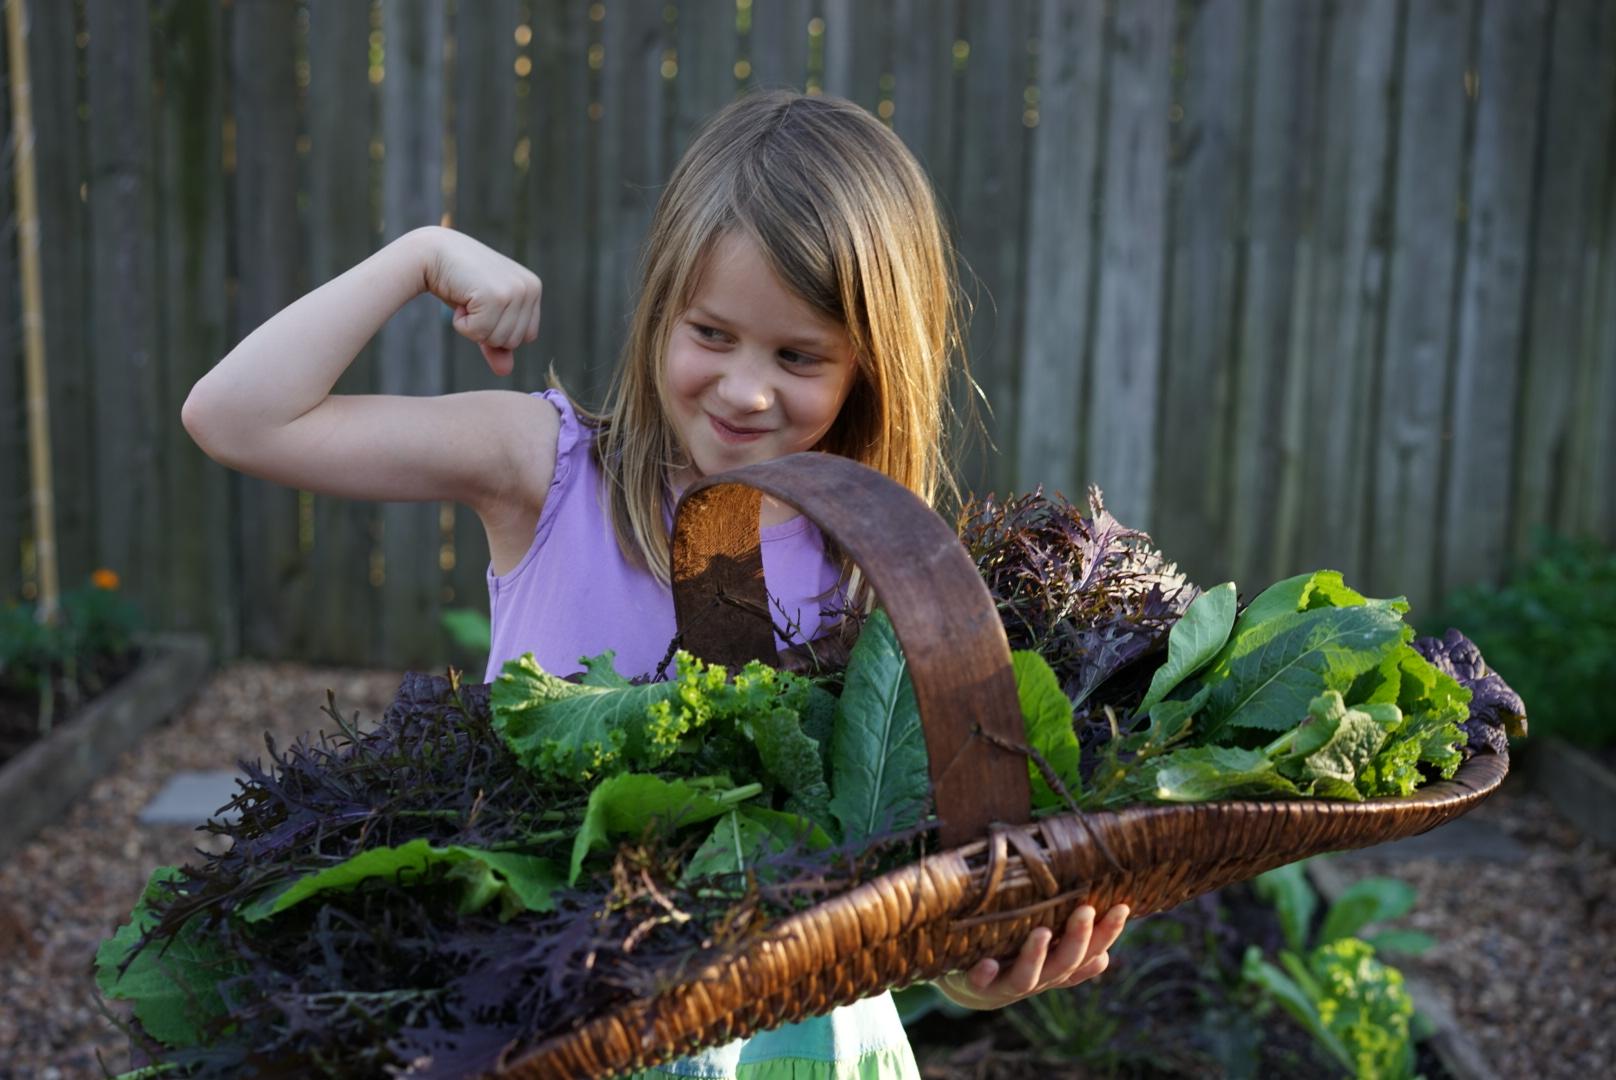 Encyclopedia Botanica Podcast_Gardening with Kids_Nicole Burke